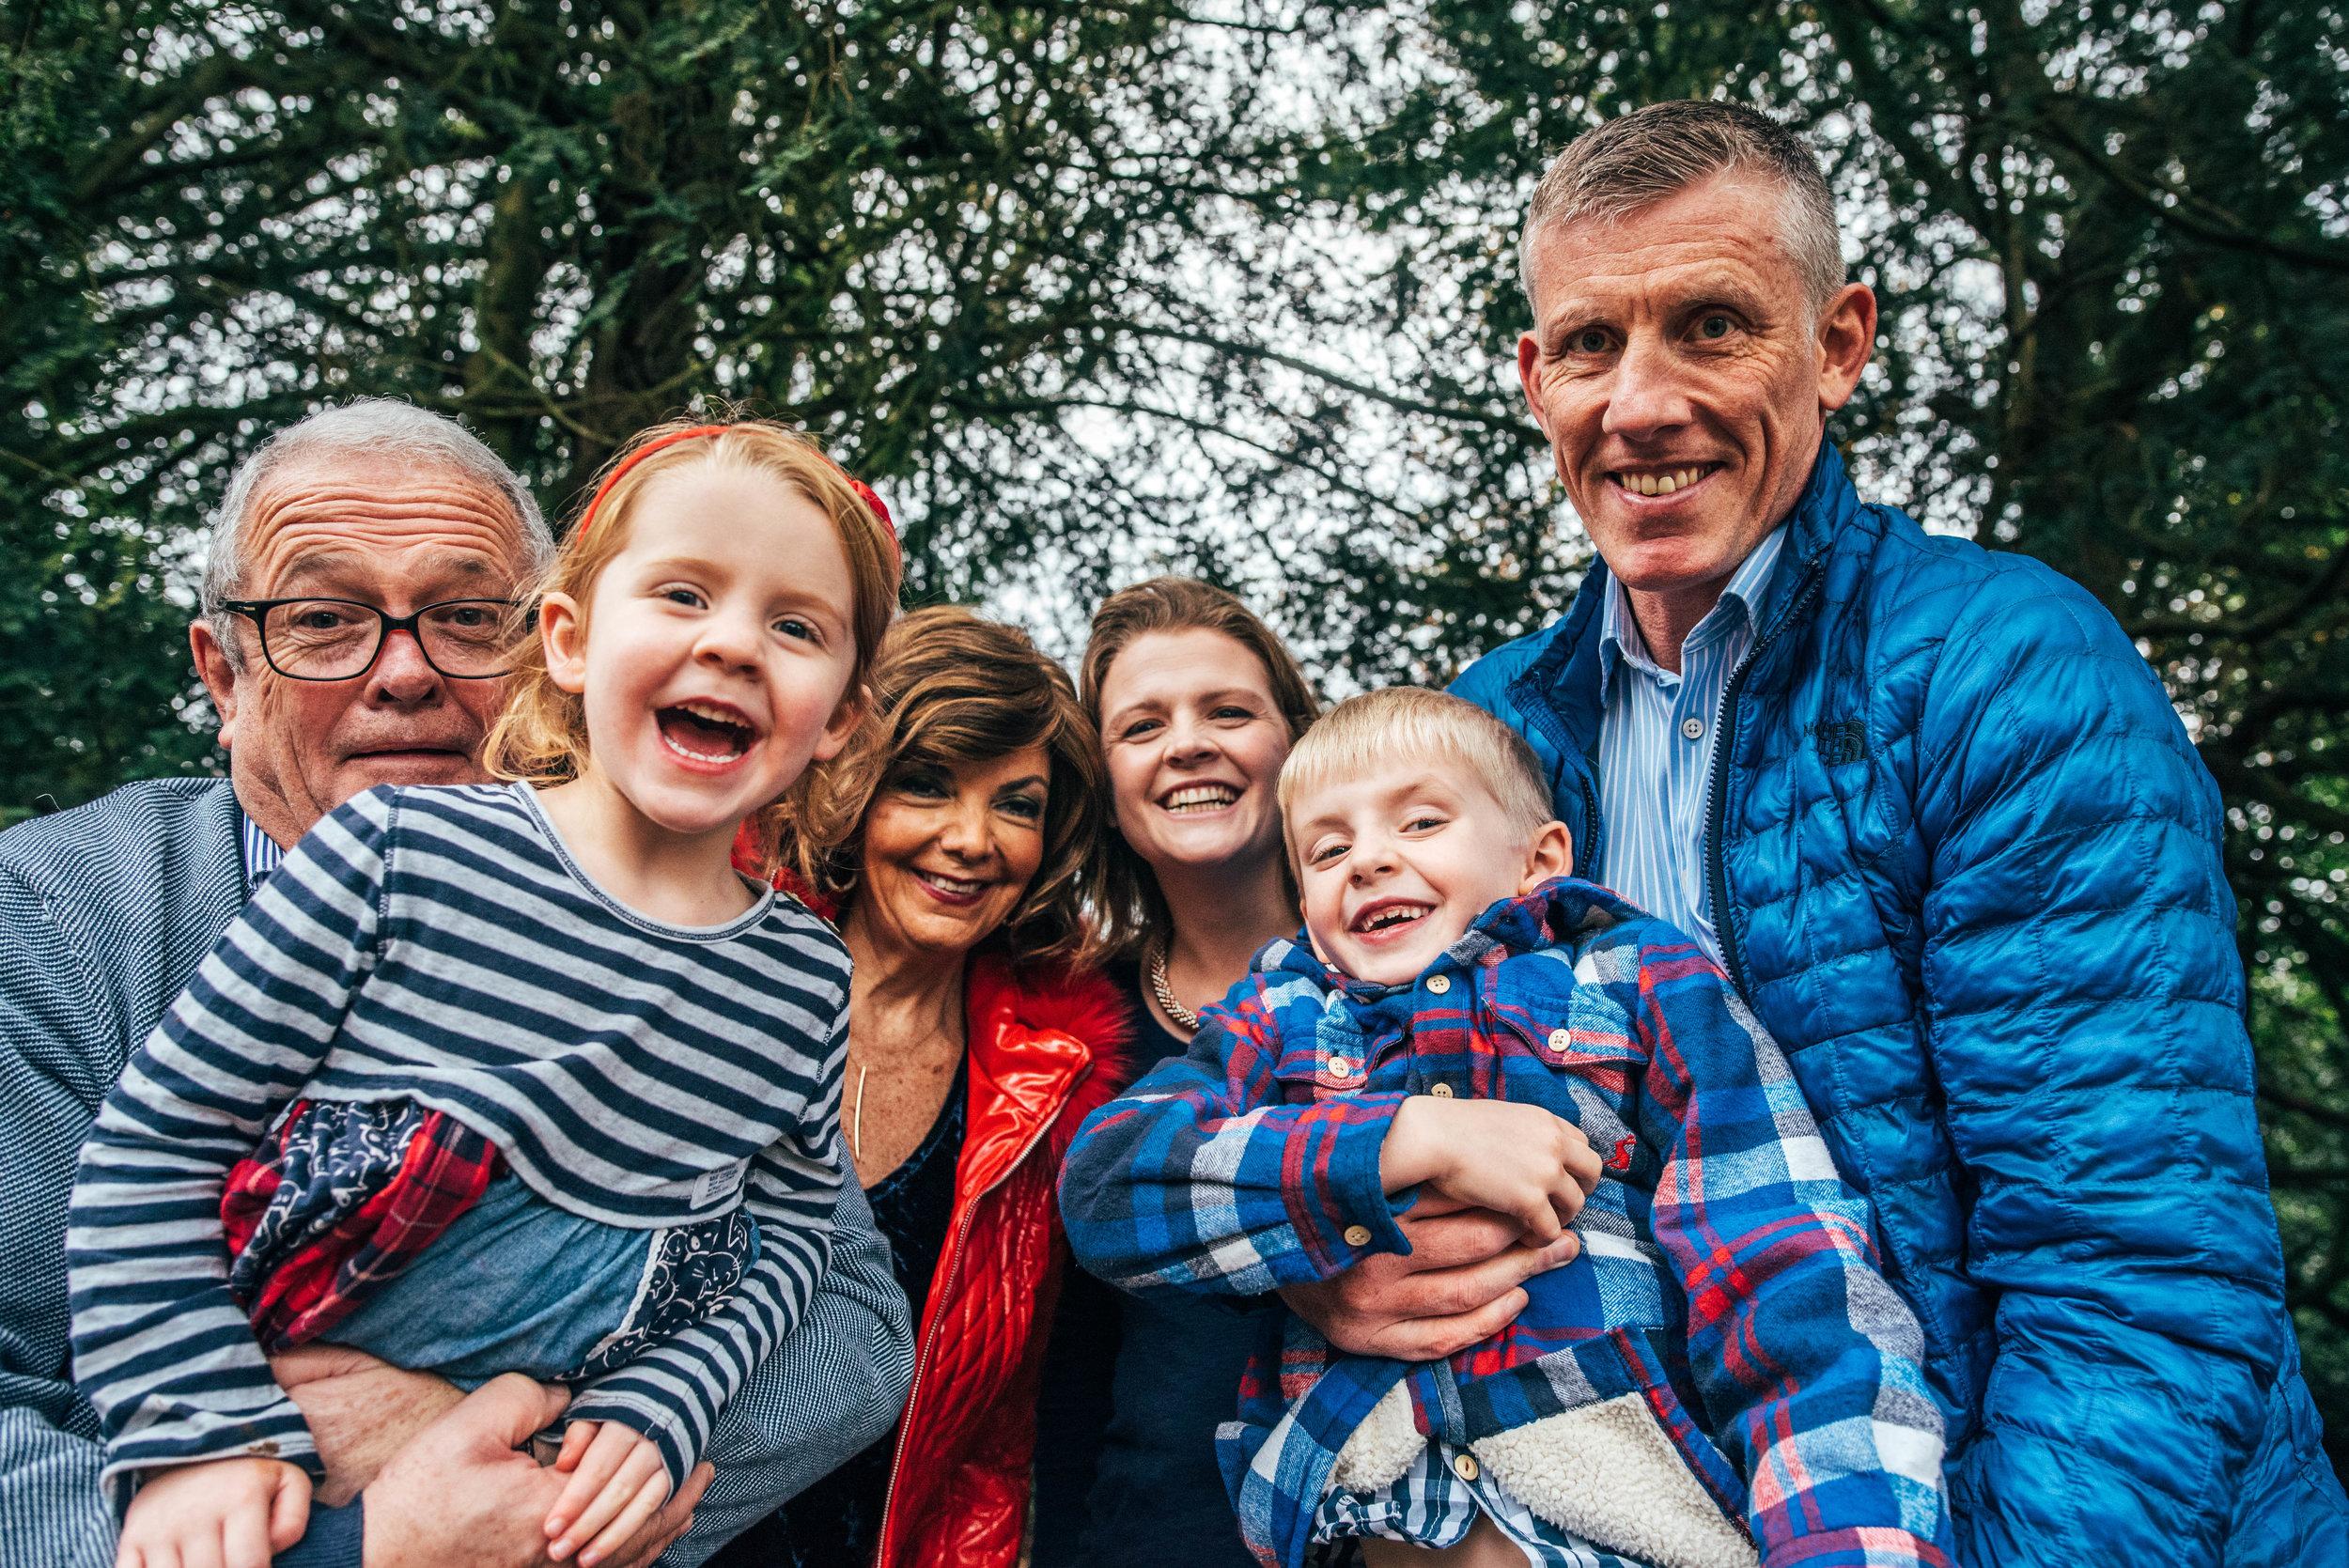 Parents, Grandparents, Kids at Hylands House Essex Documentary Portrait Photographer